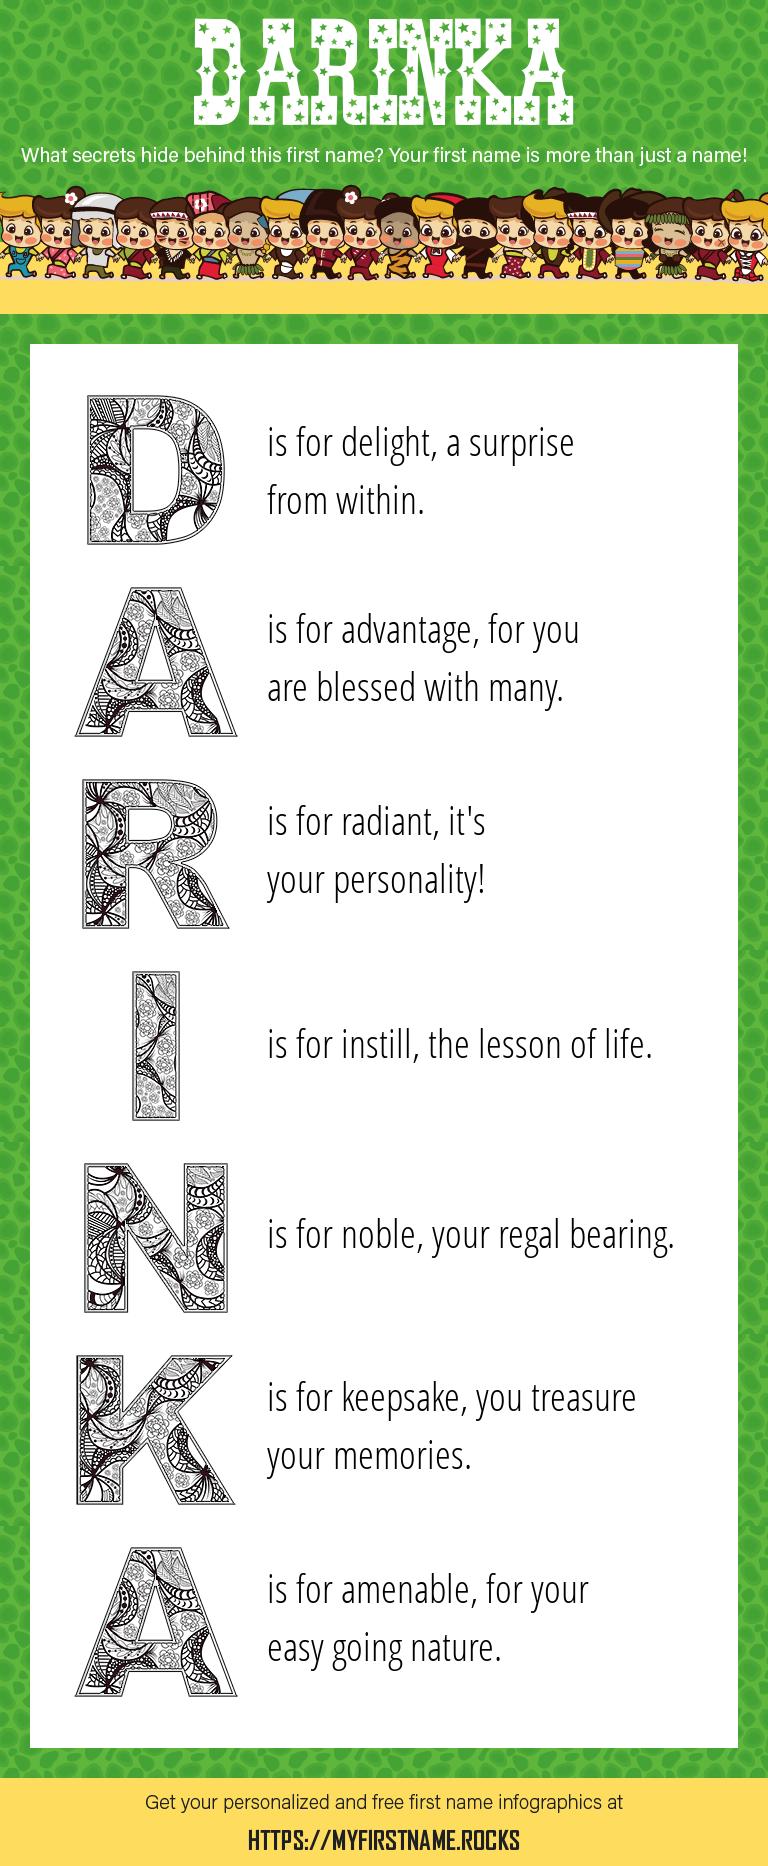 Darinka Infographics